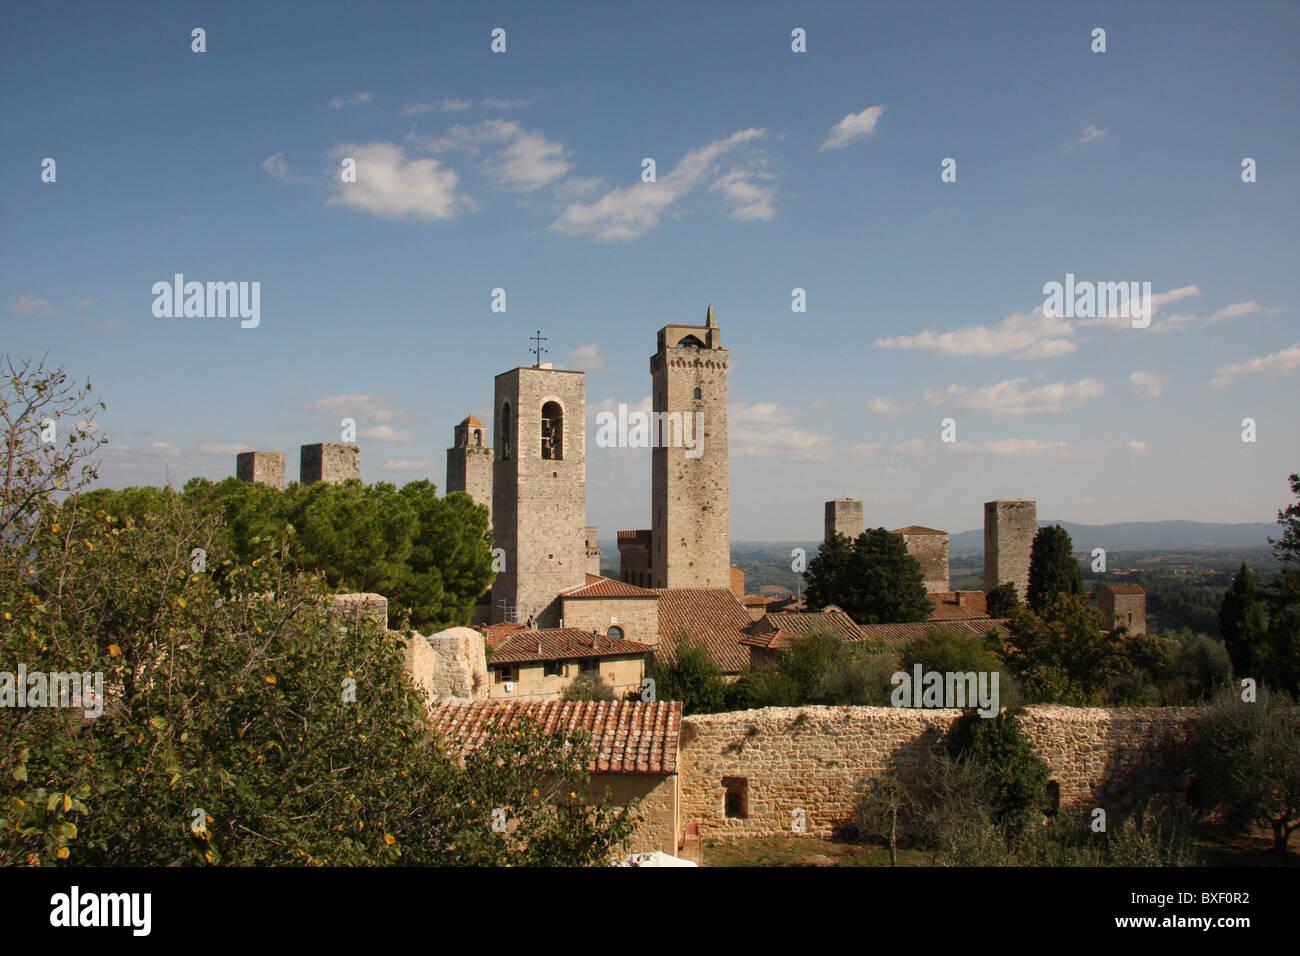 View of San Gimignano - Stock Image